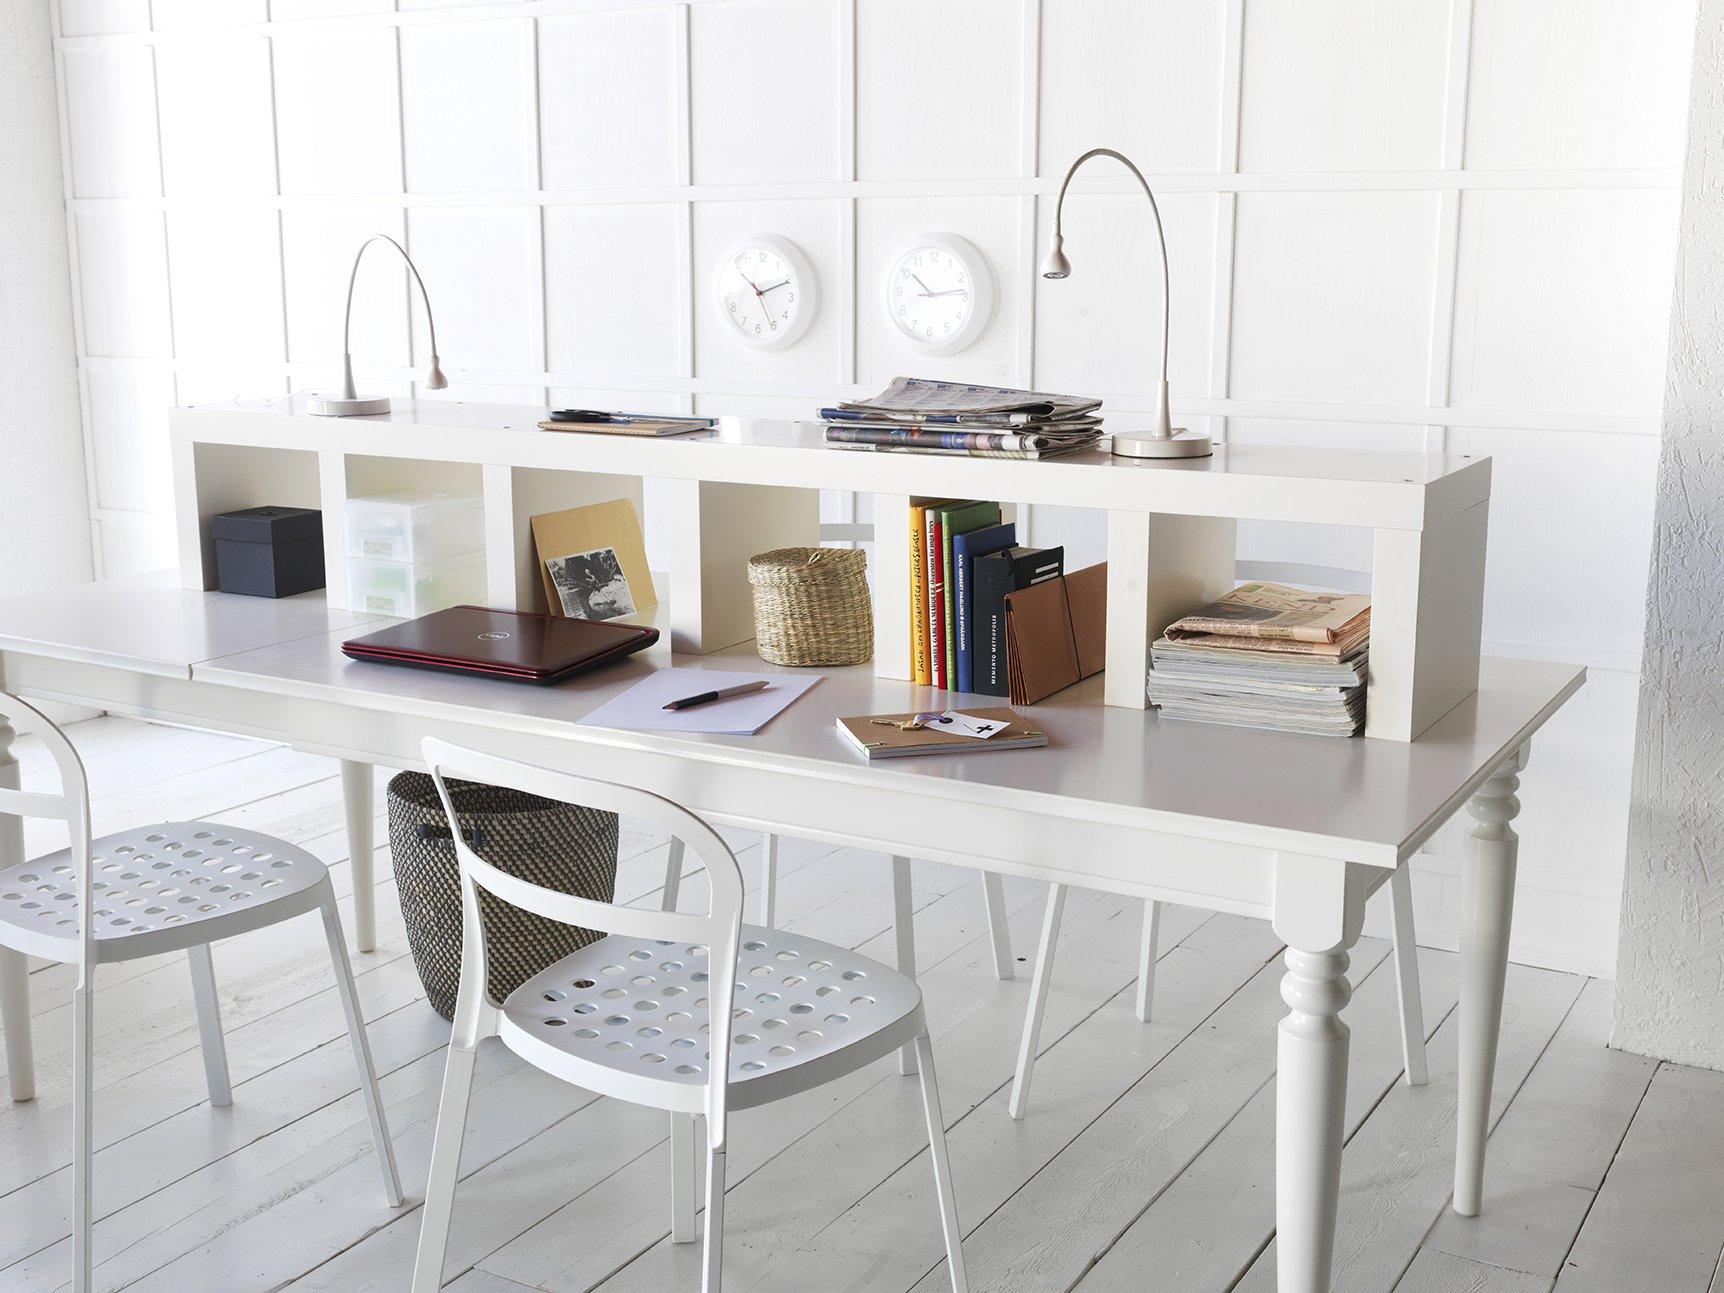 Tavolo Tondo Allungabile Ikea. Tavolo Rotondo Bianco Allungabile ...